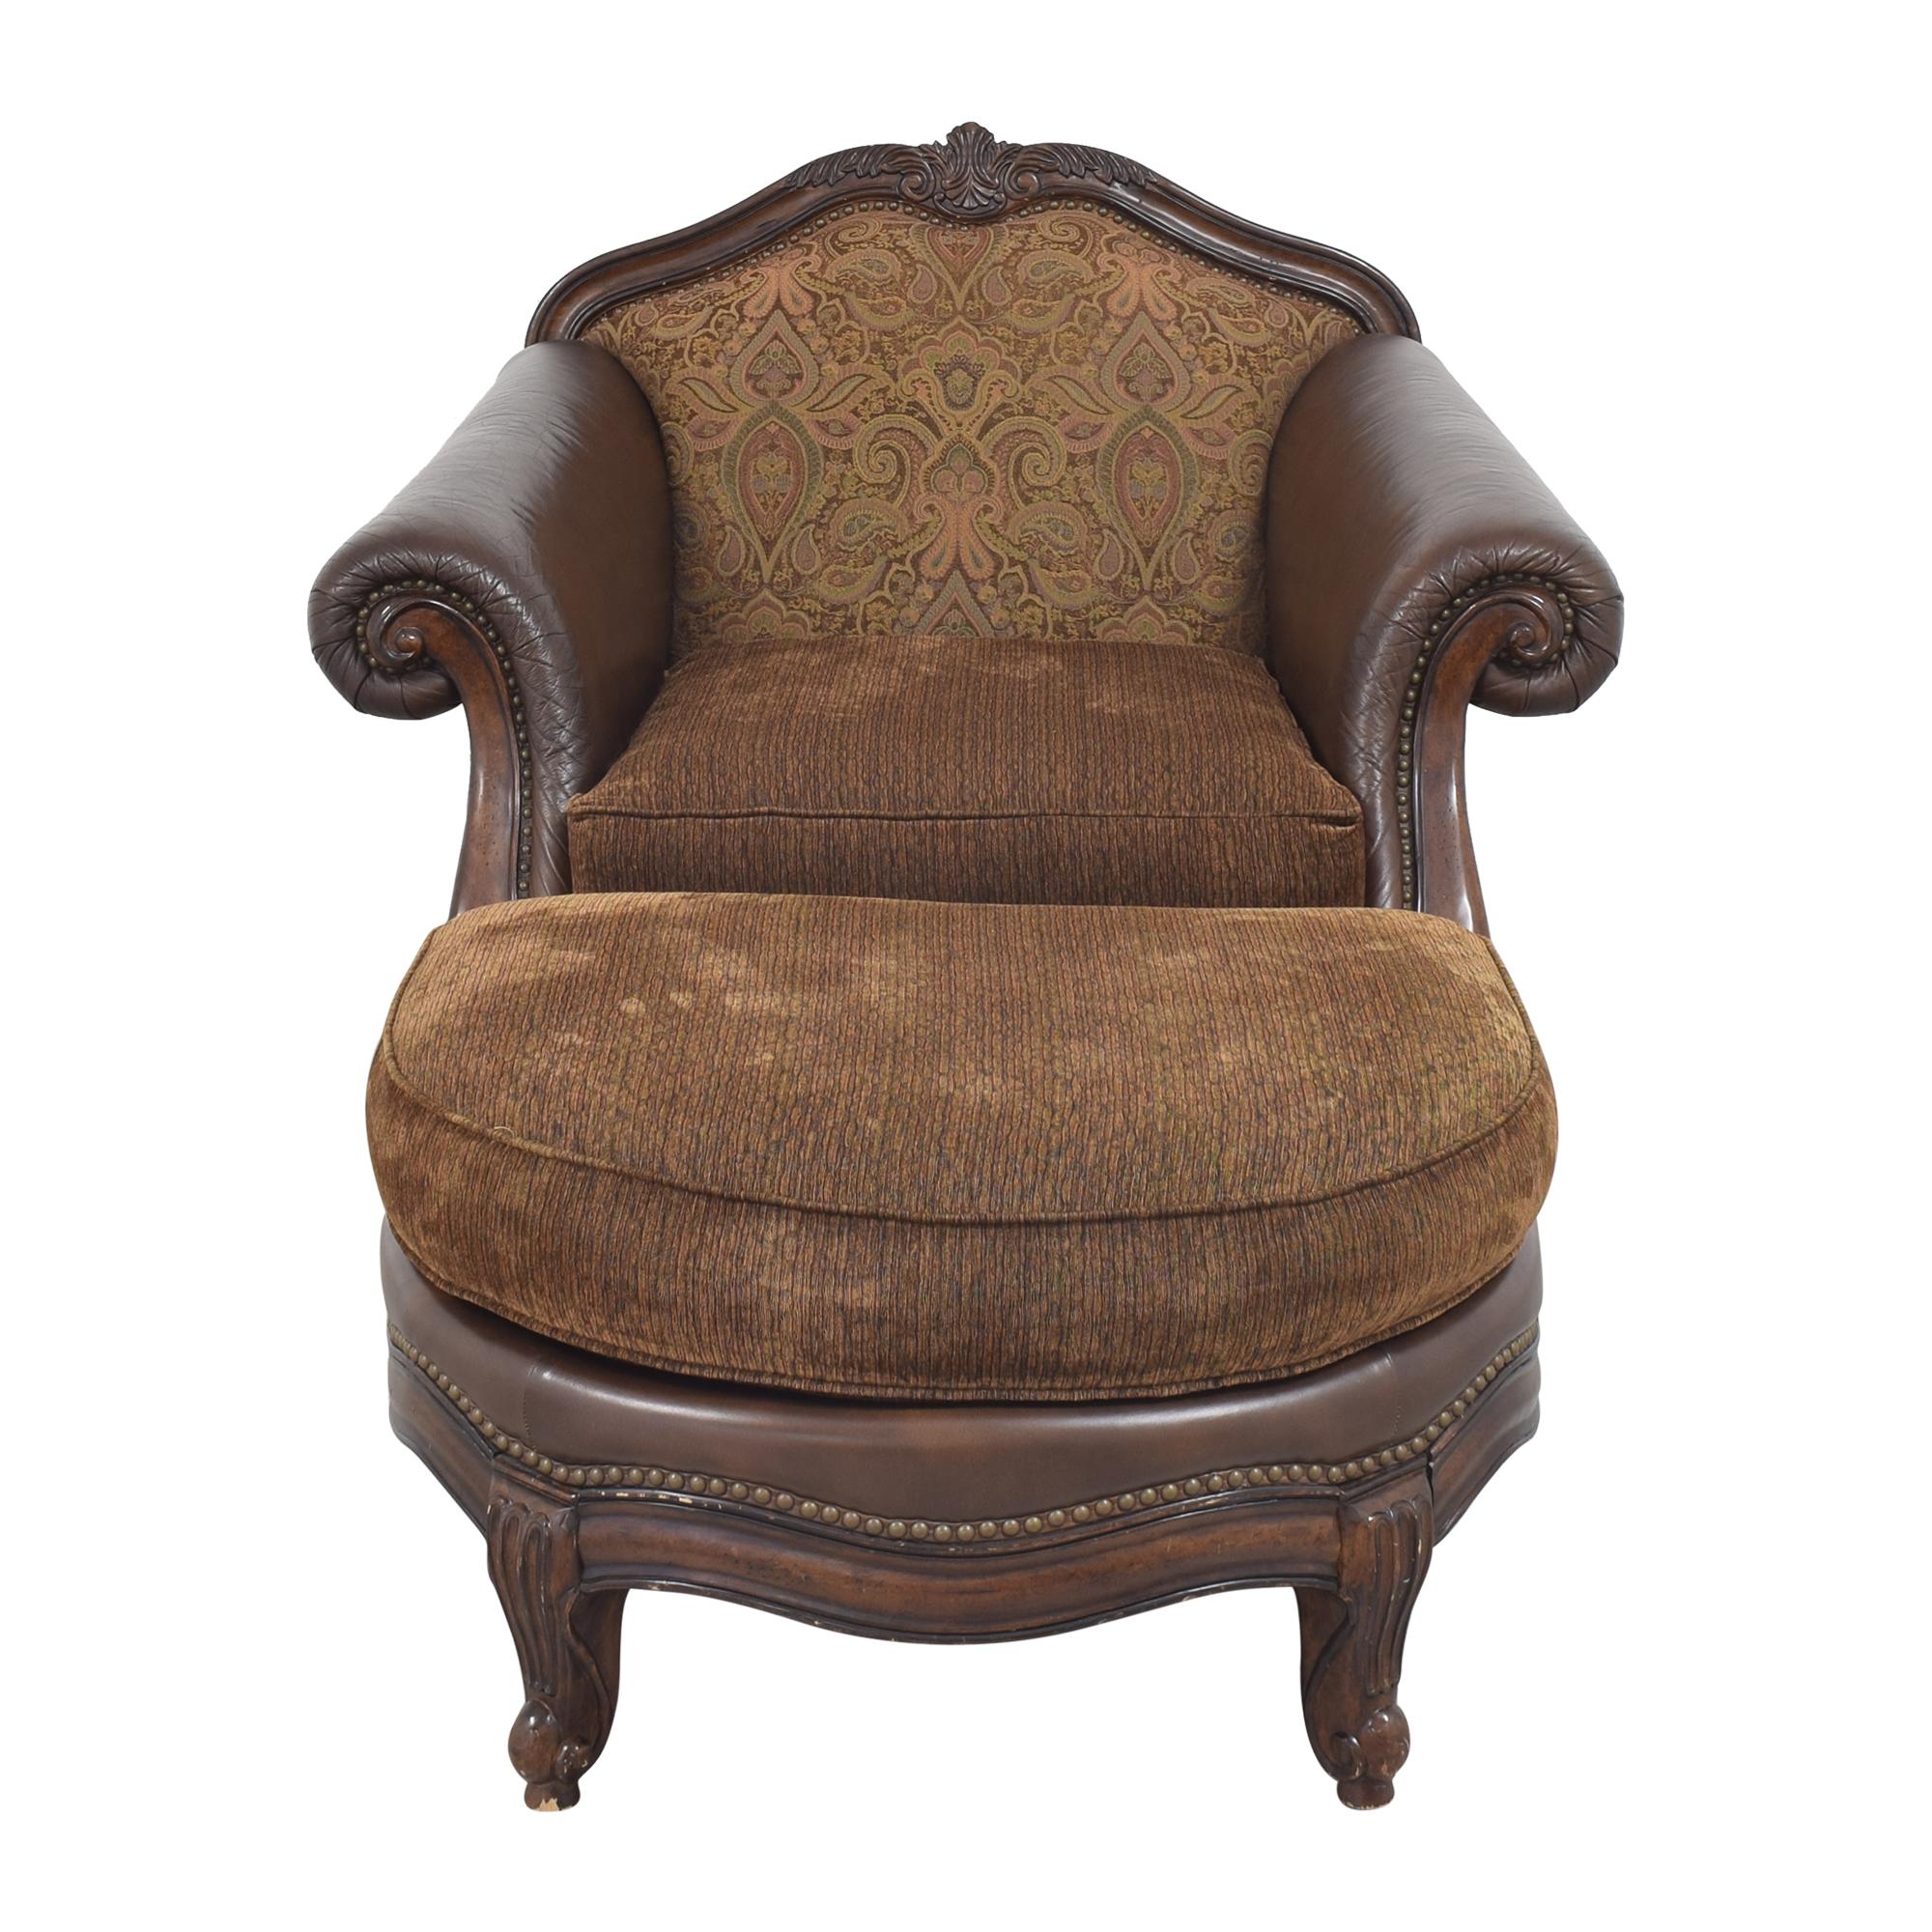 Raymour & Flanigan Raymour & Flanigan Natalia Chair with Ottoman dimensions